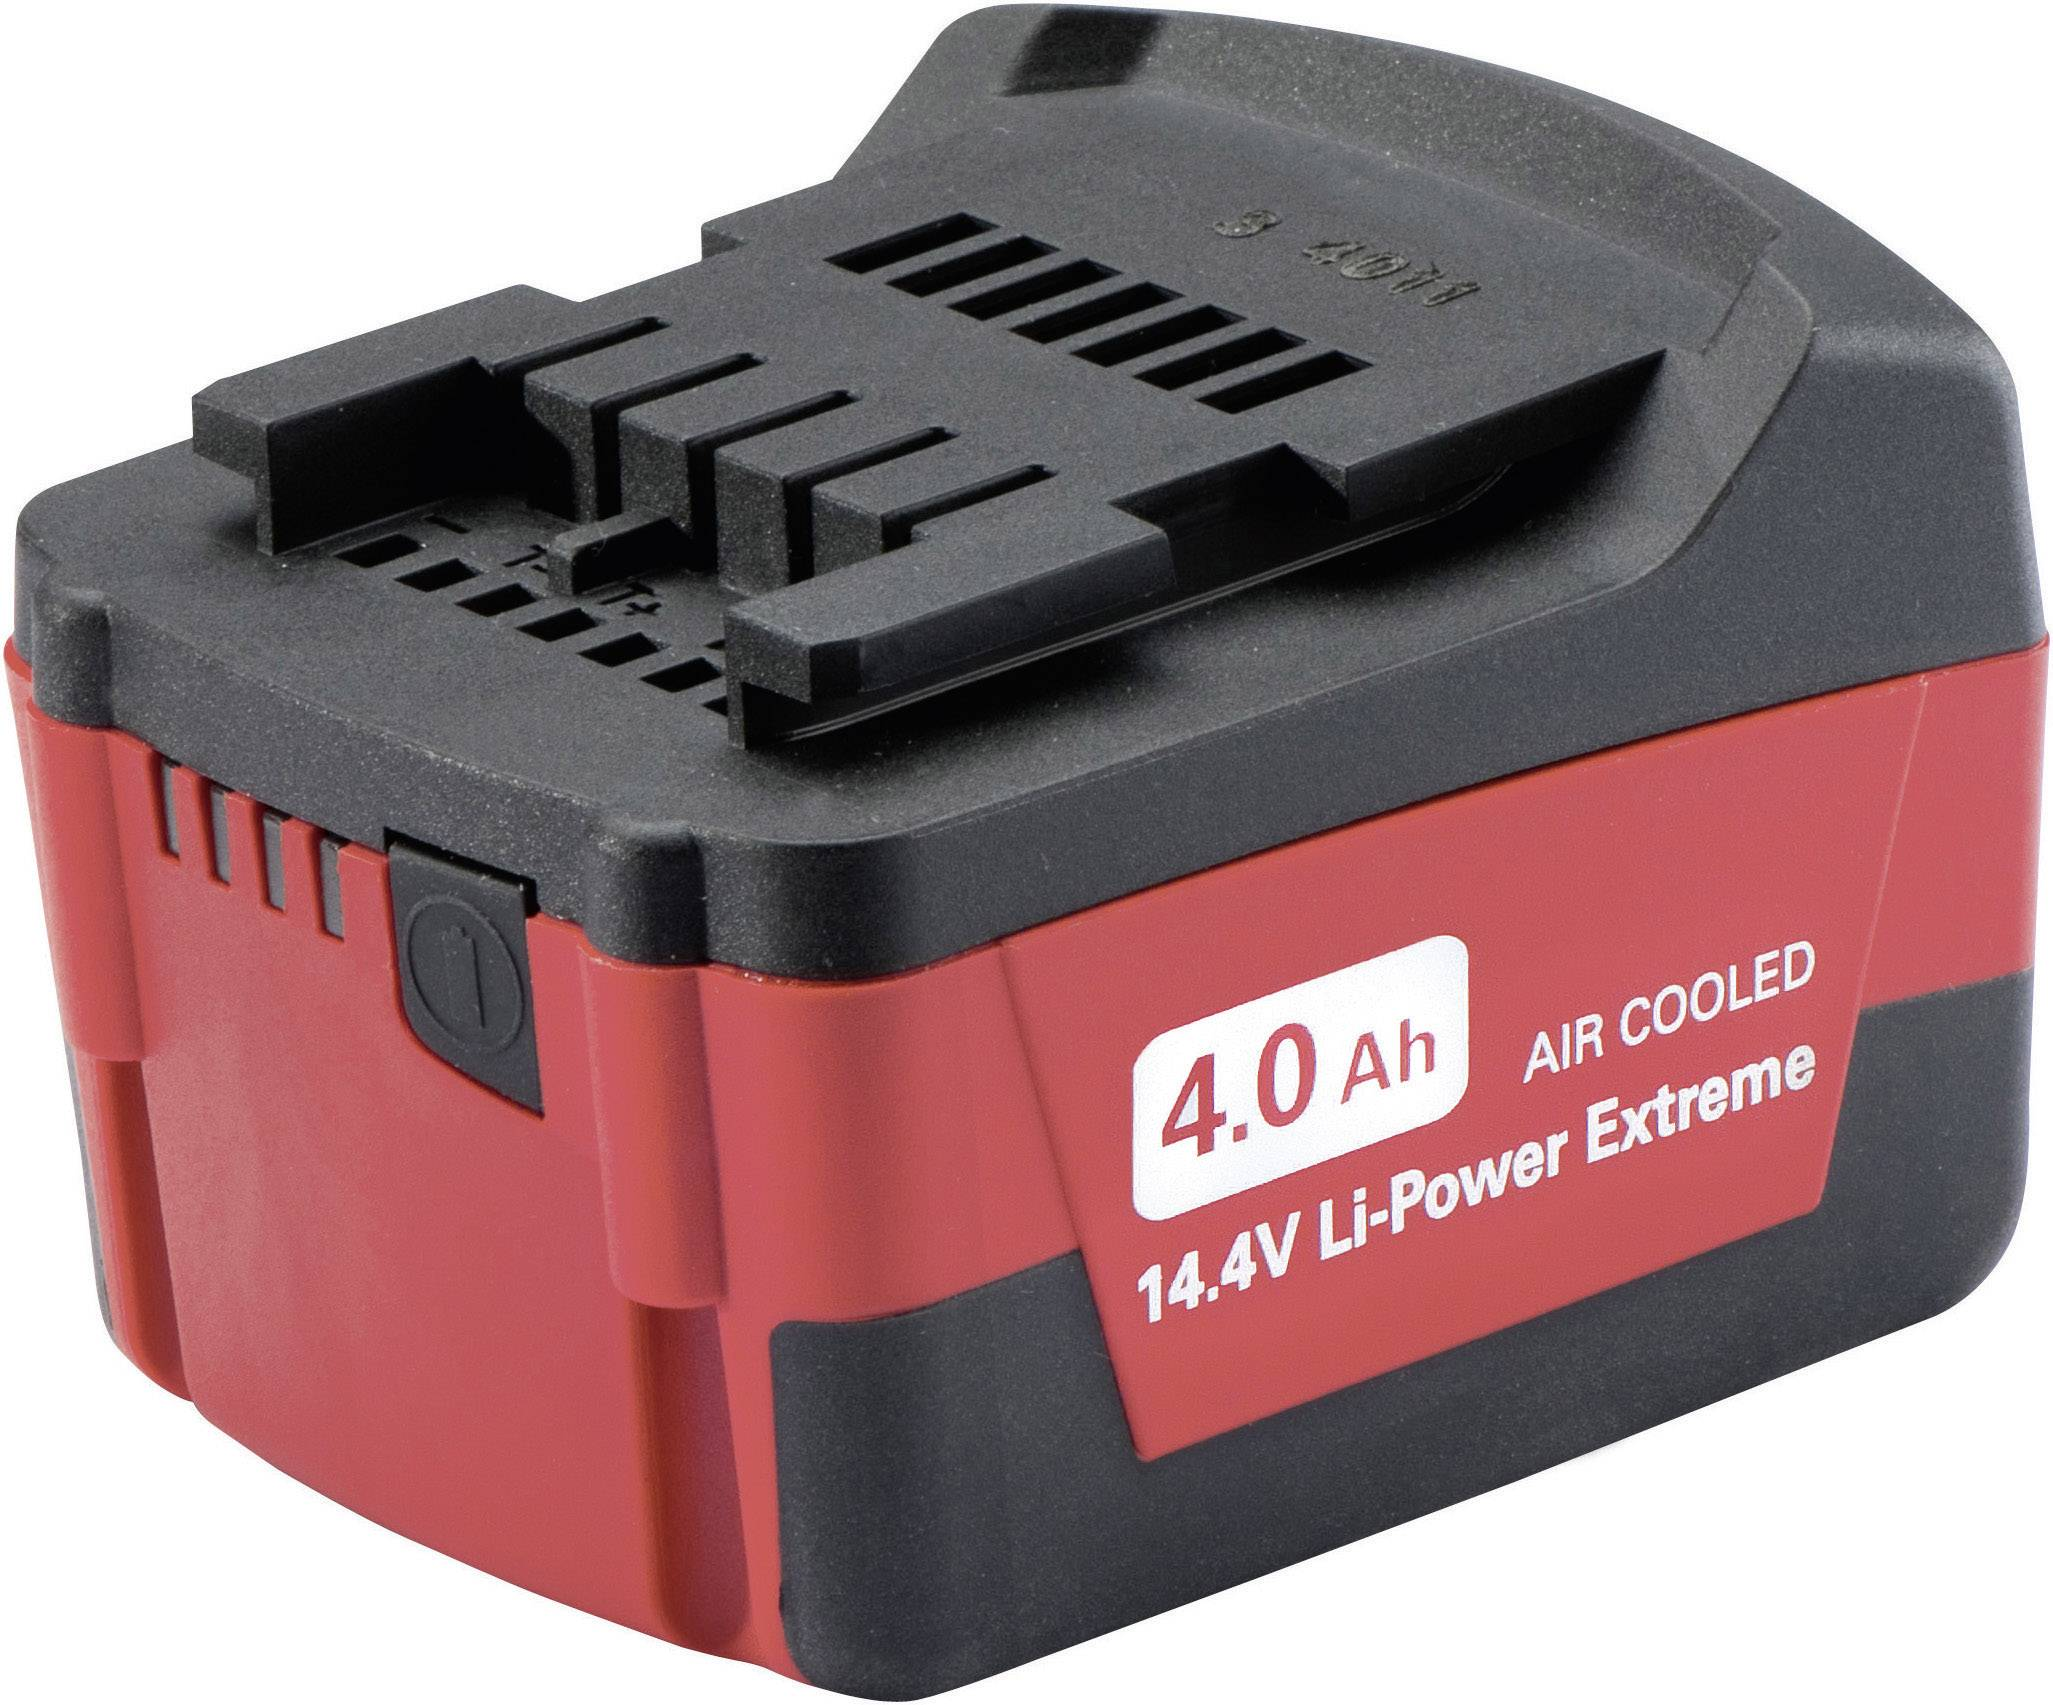 Akumulátor Metabo Li-Power Extreme, 14.4 V, 4 Ah, 625526000